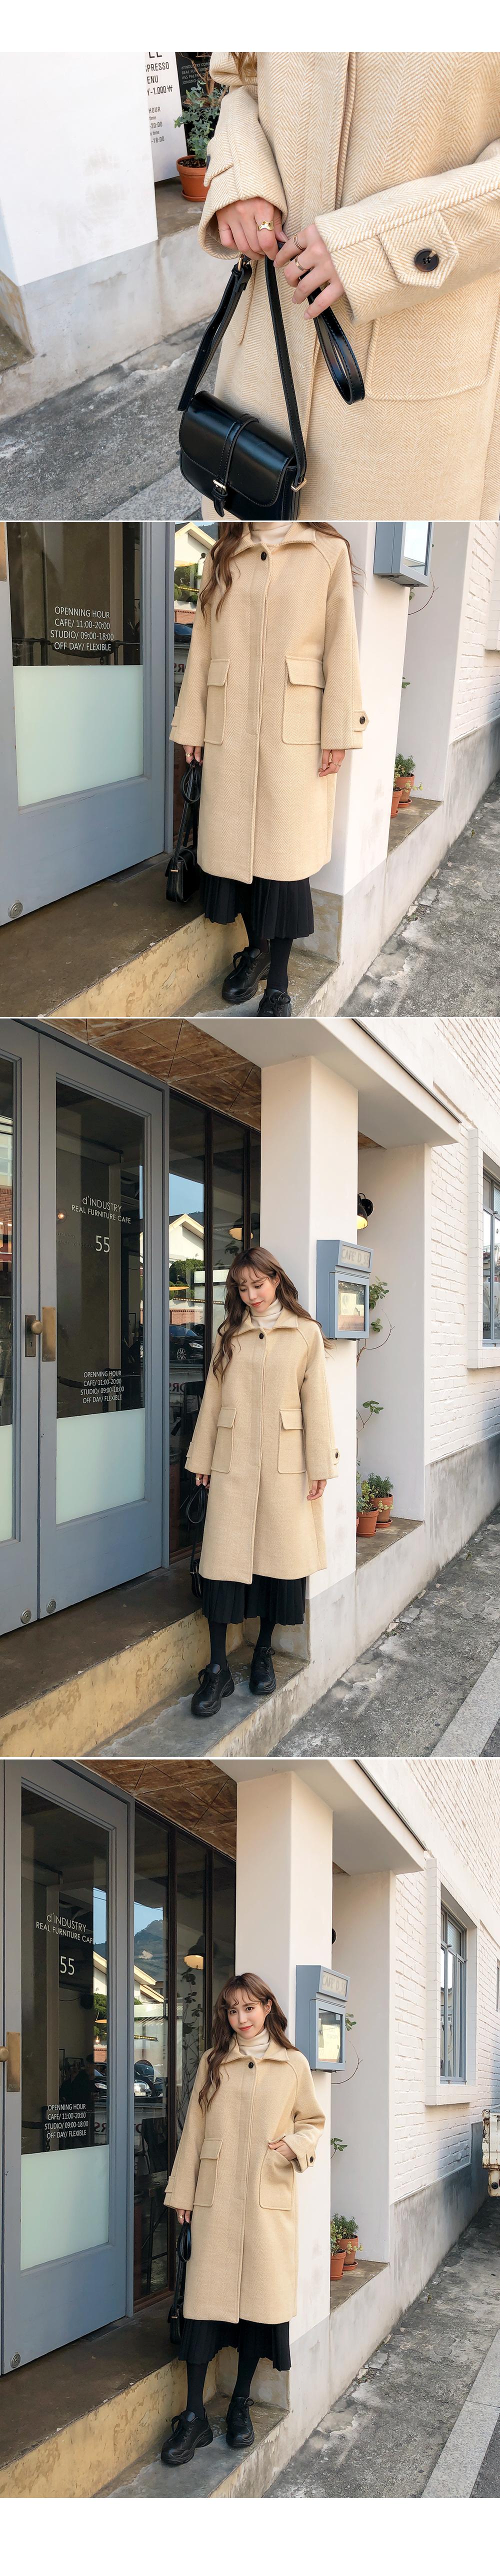 Bright herringbone coat